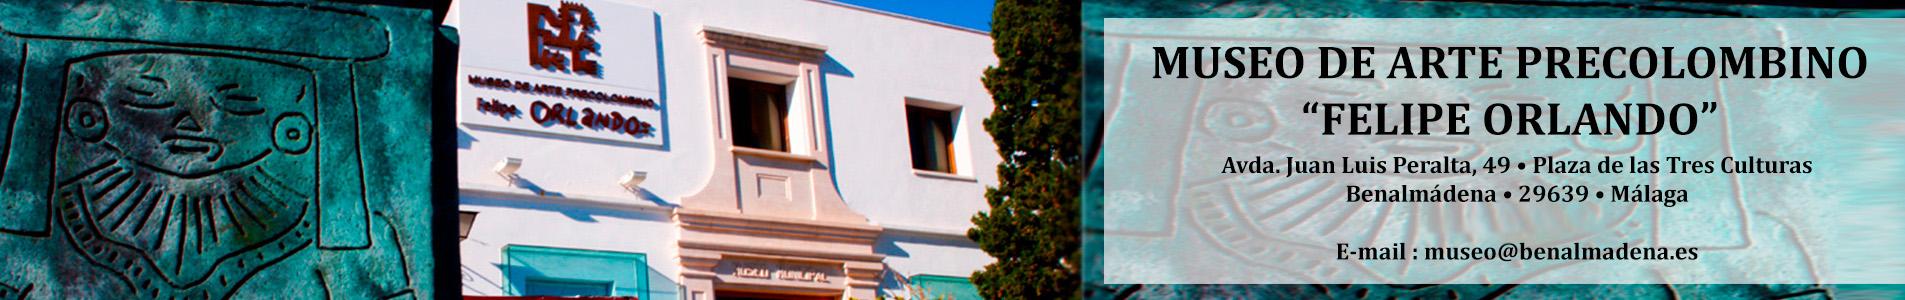 Museo de Arte Precolombino Felipe Orlando